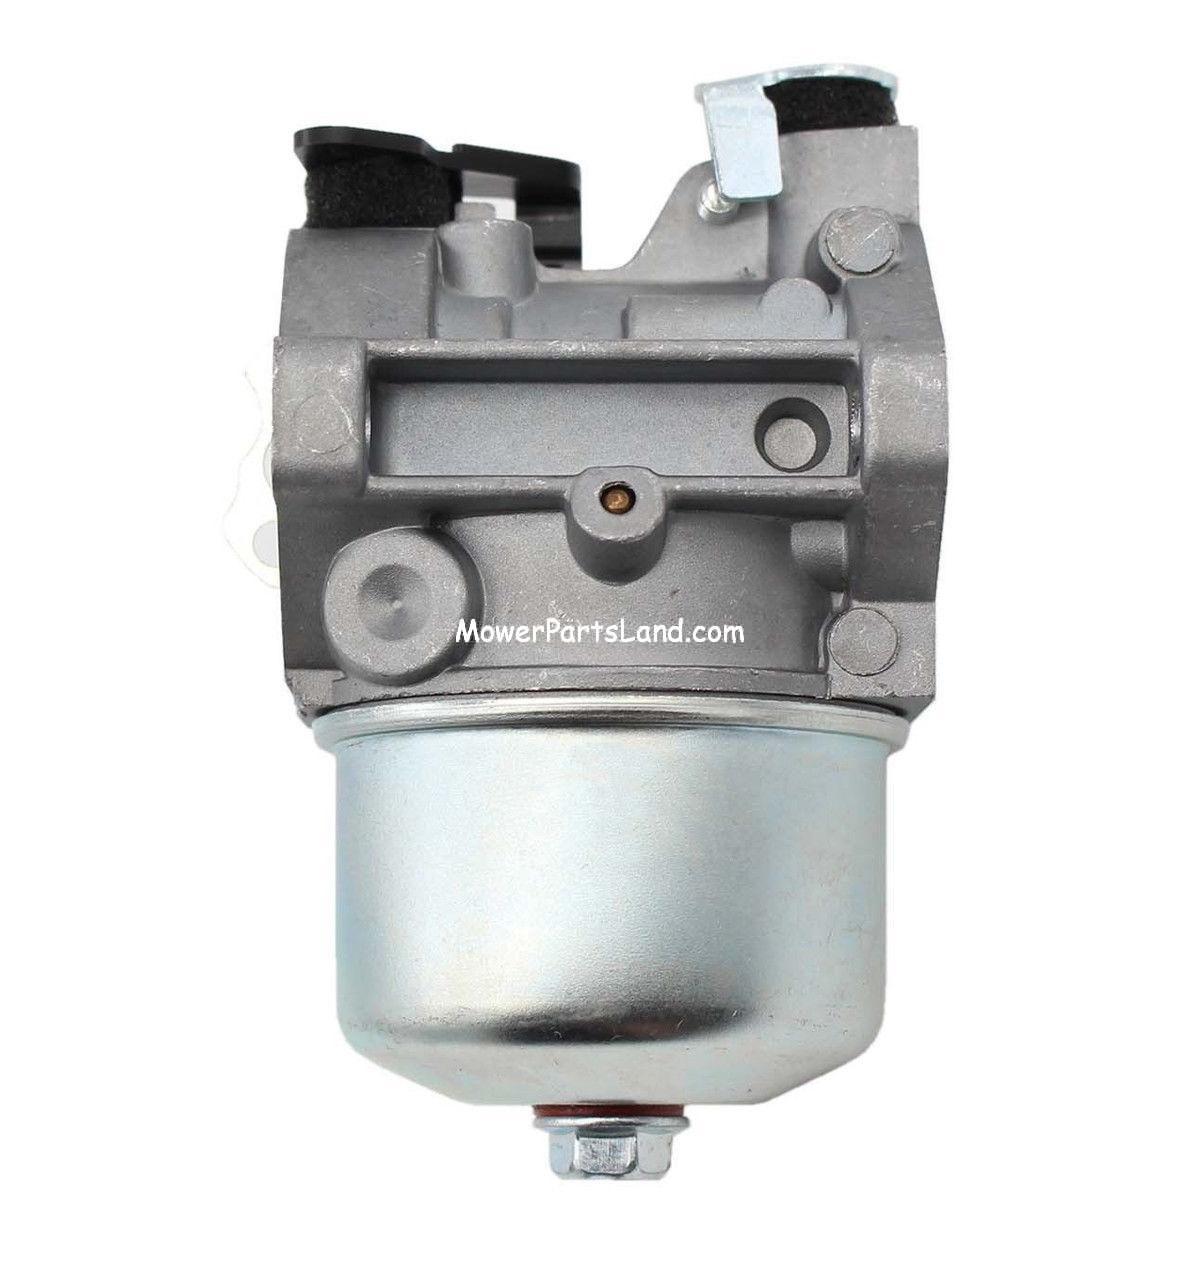 Carburetor for briggs and stratton 28b702013401 28b702